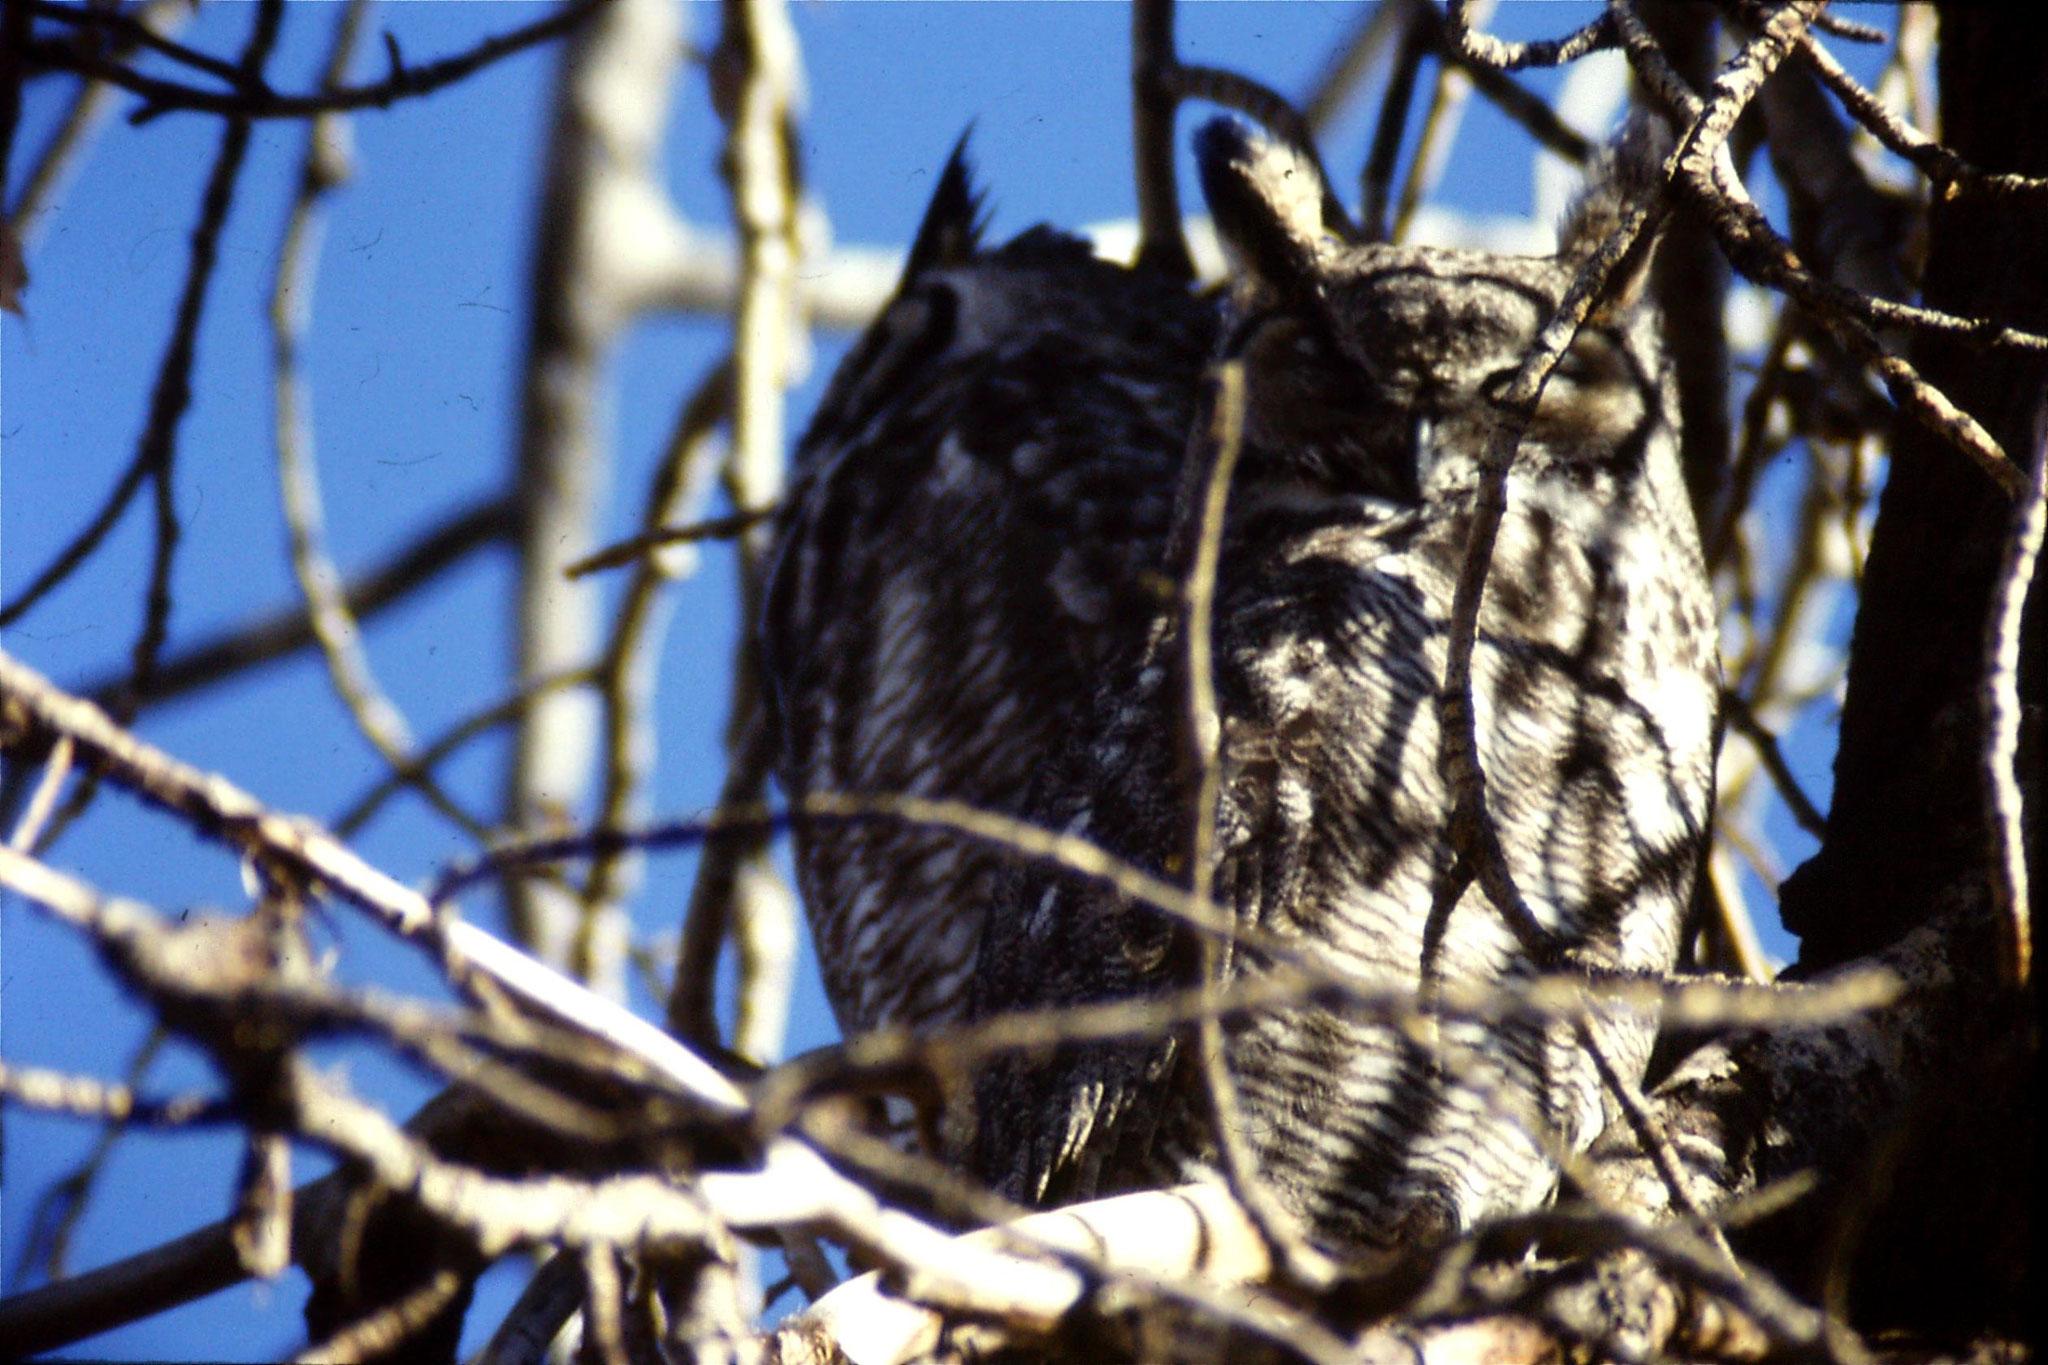 23/1/1991: 24: Gt Horned owls